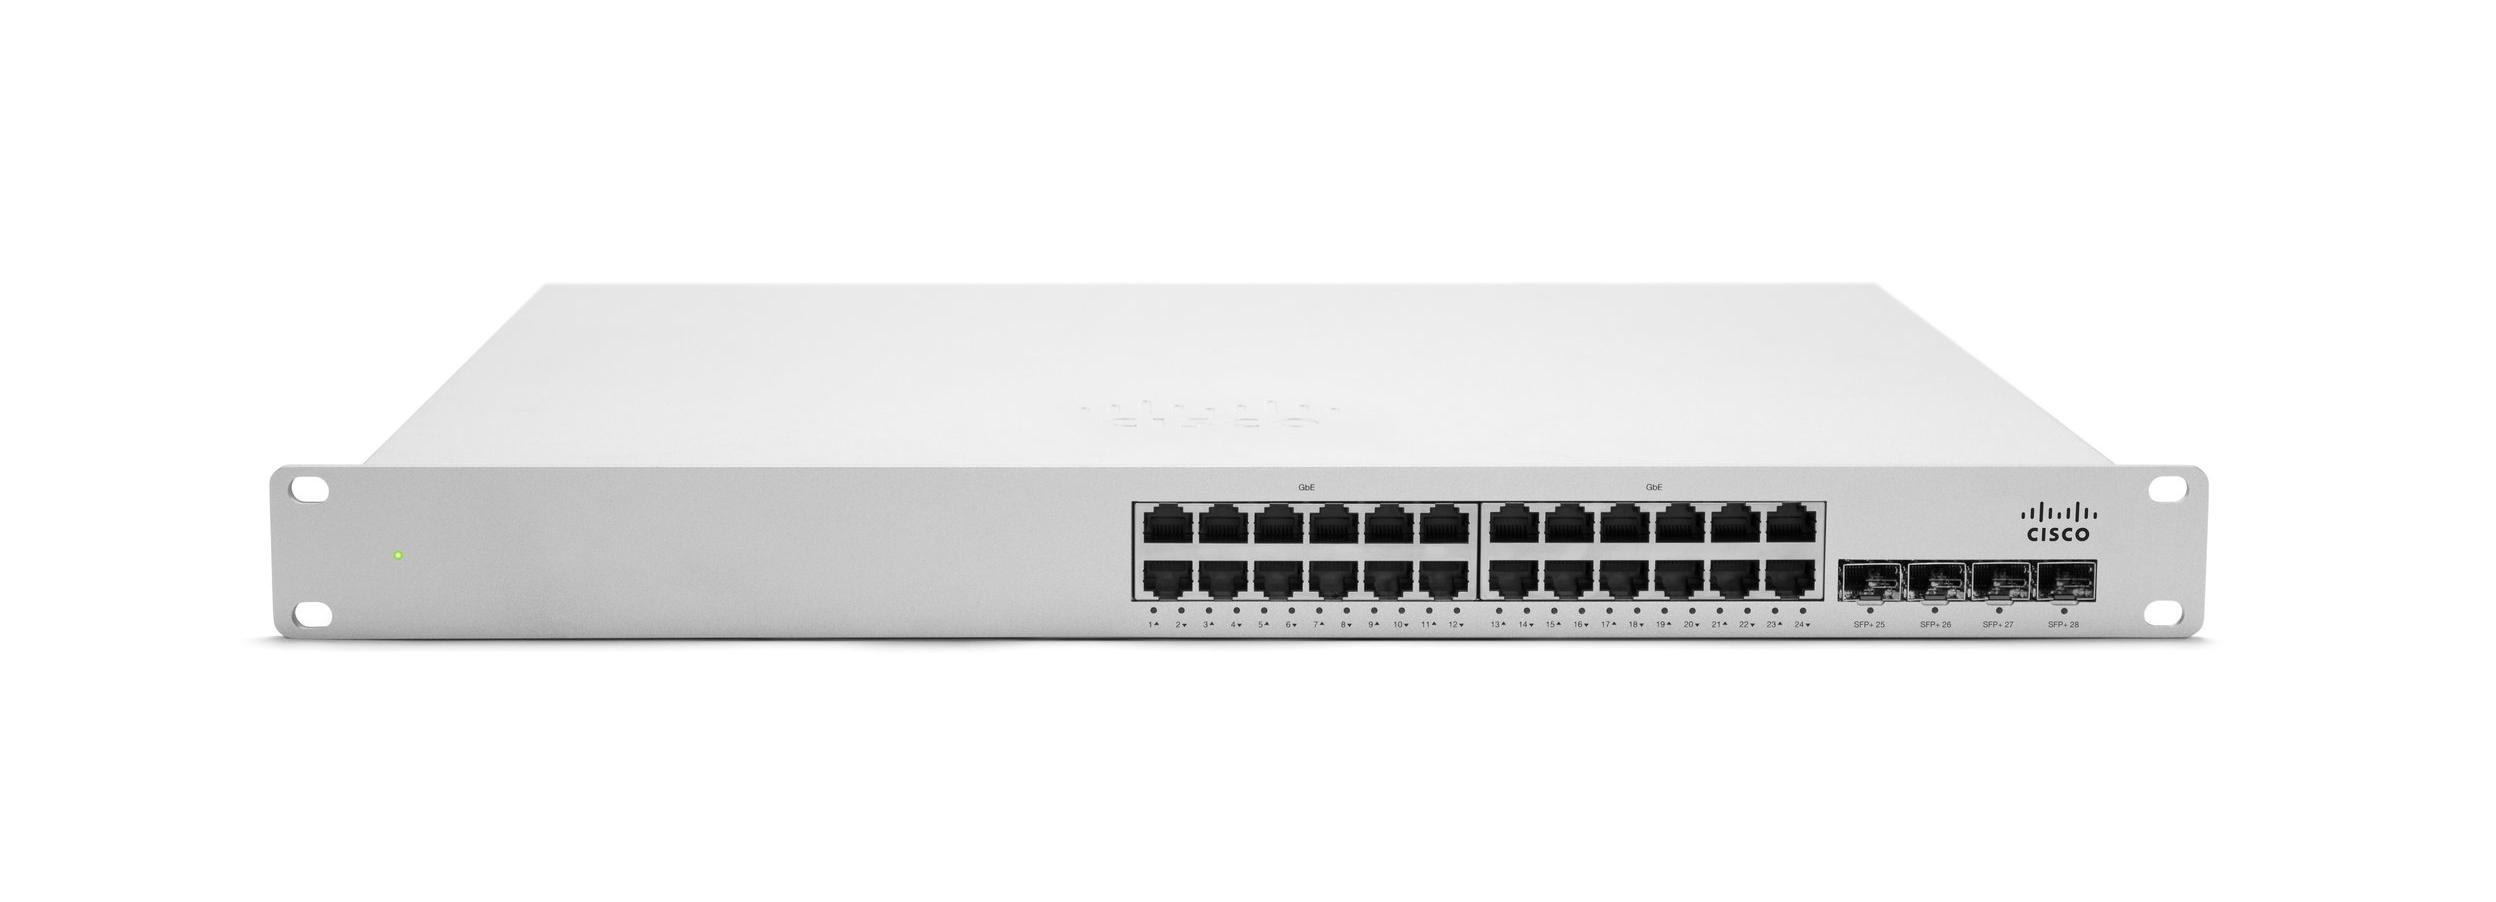 Cisco Meraki Stackable Access Switch MS350-24